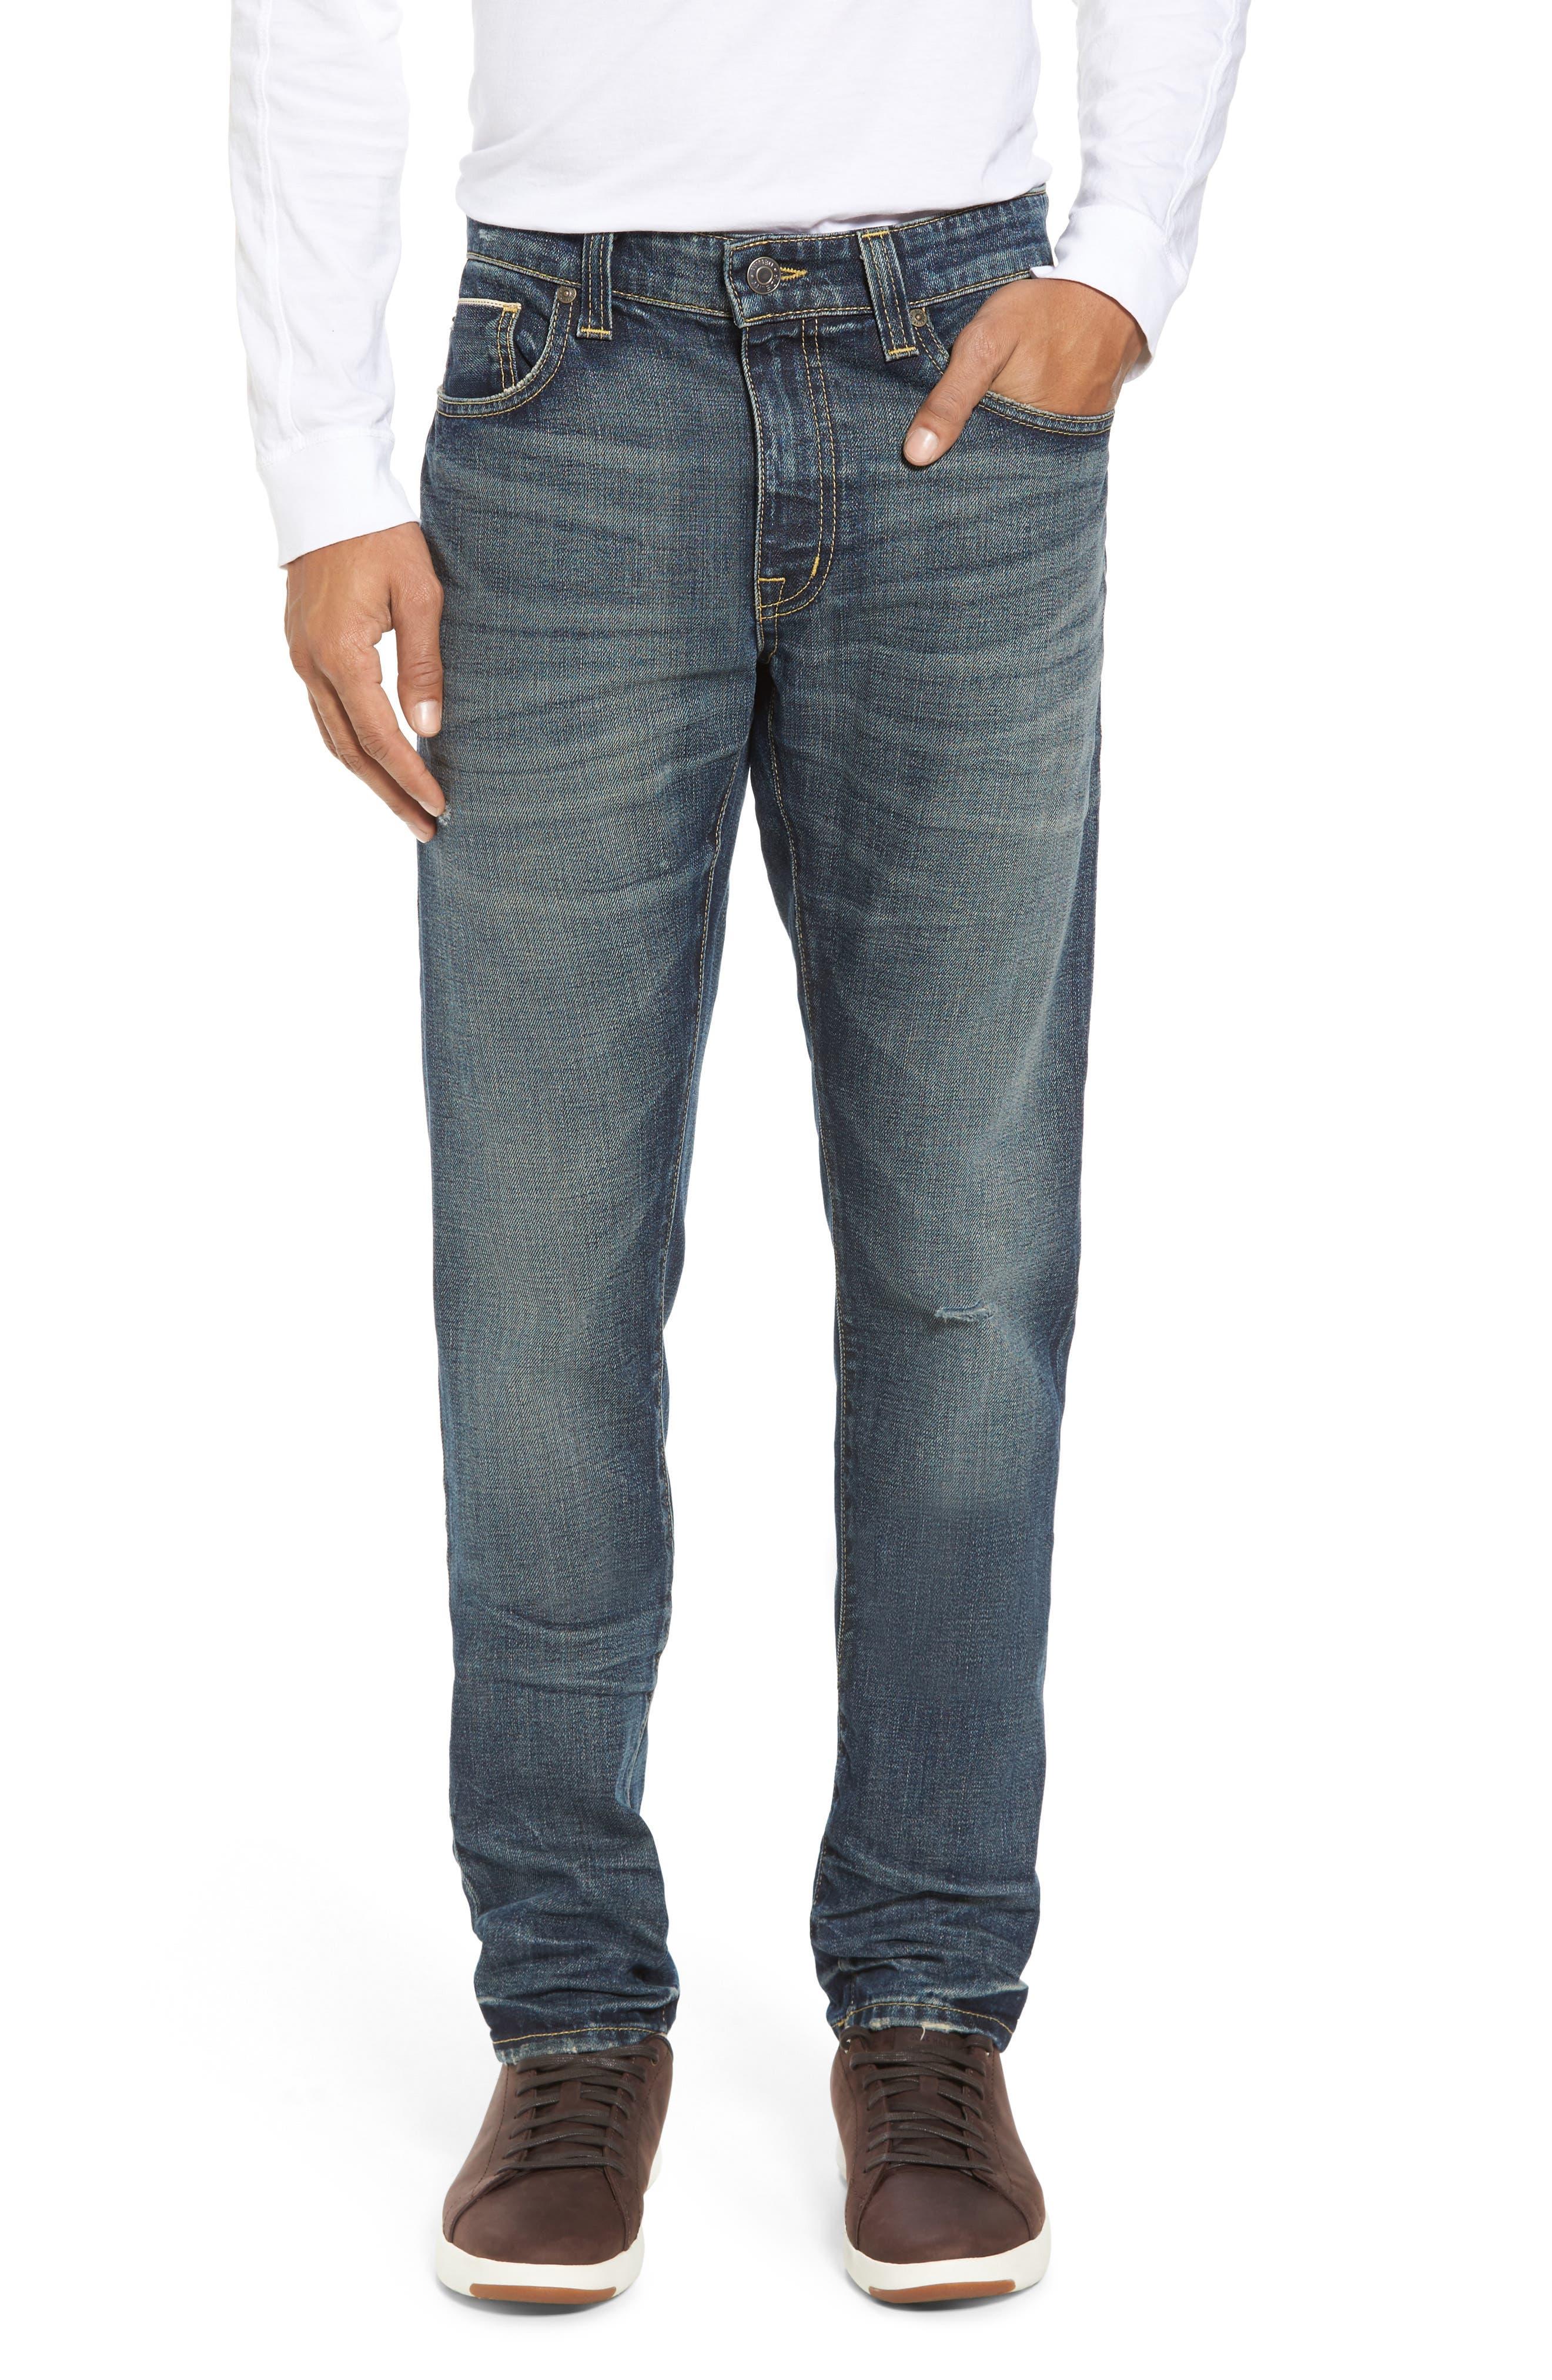 Fideltiy Denim Torino Slim Fit Jeans,                         Main,                         color, 400